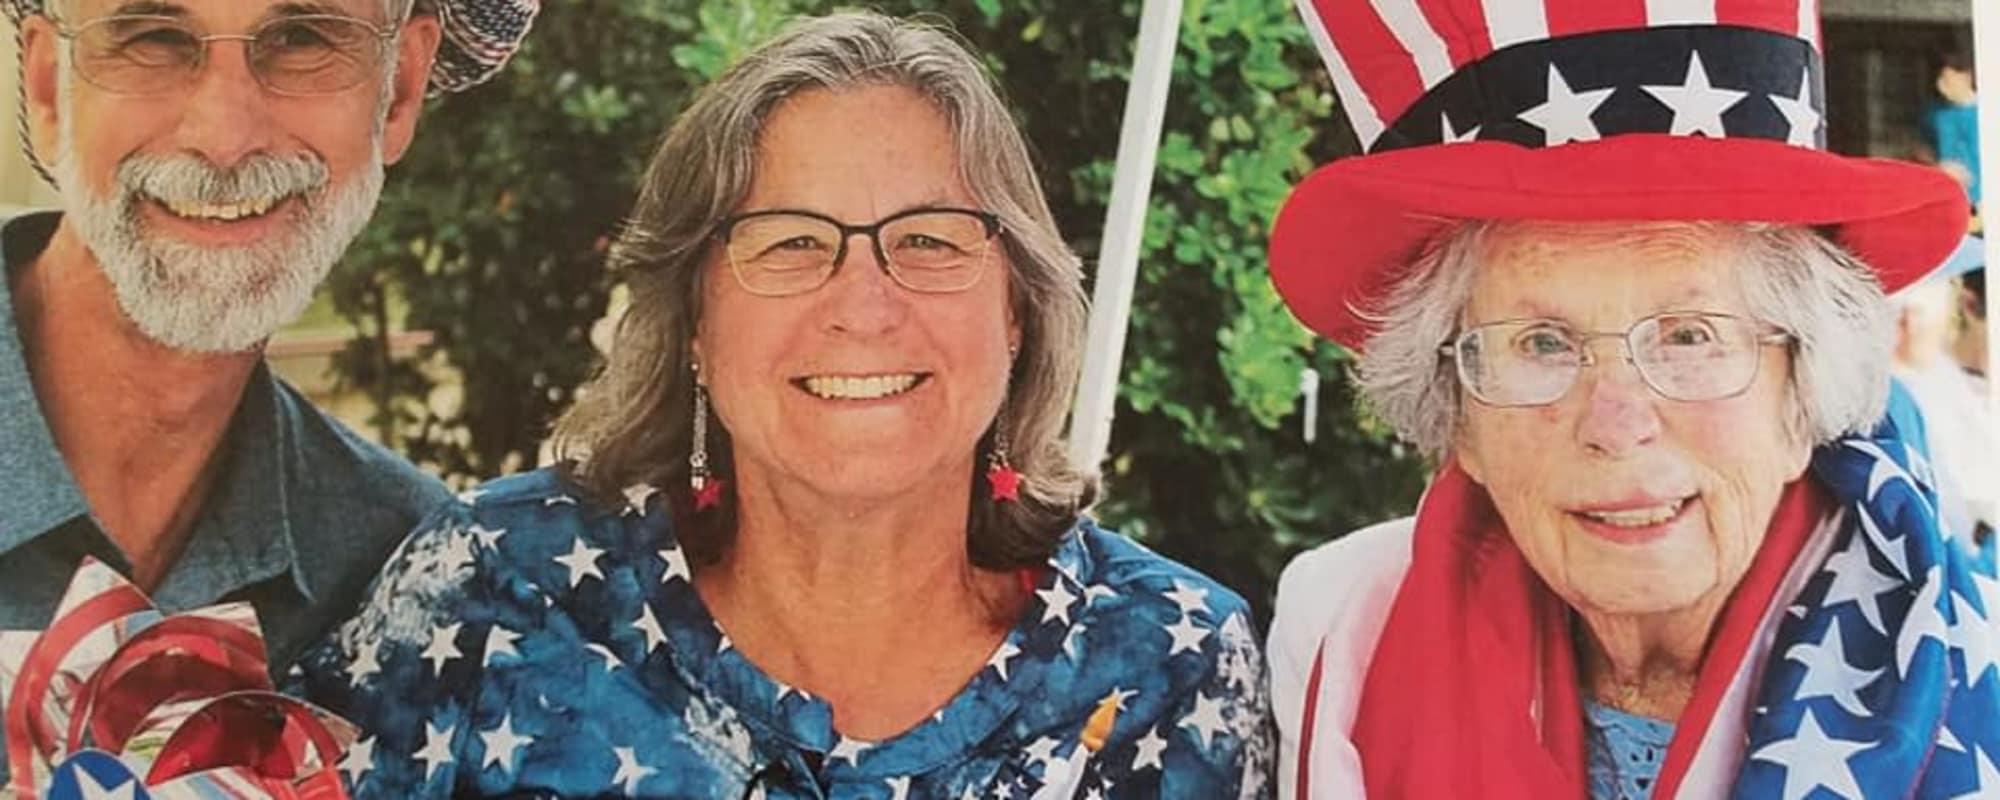 4th of July at Oakmont Gardens in Santa Rosa, California